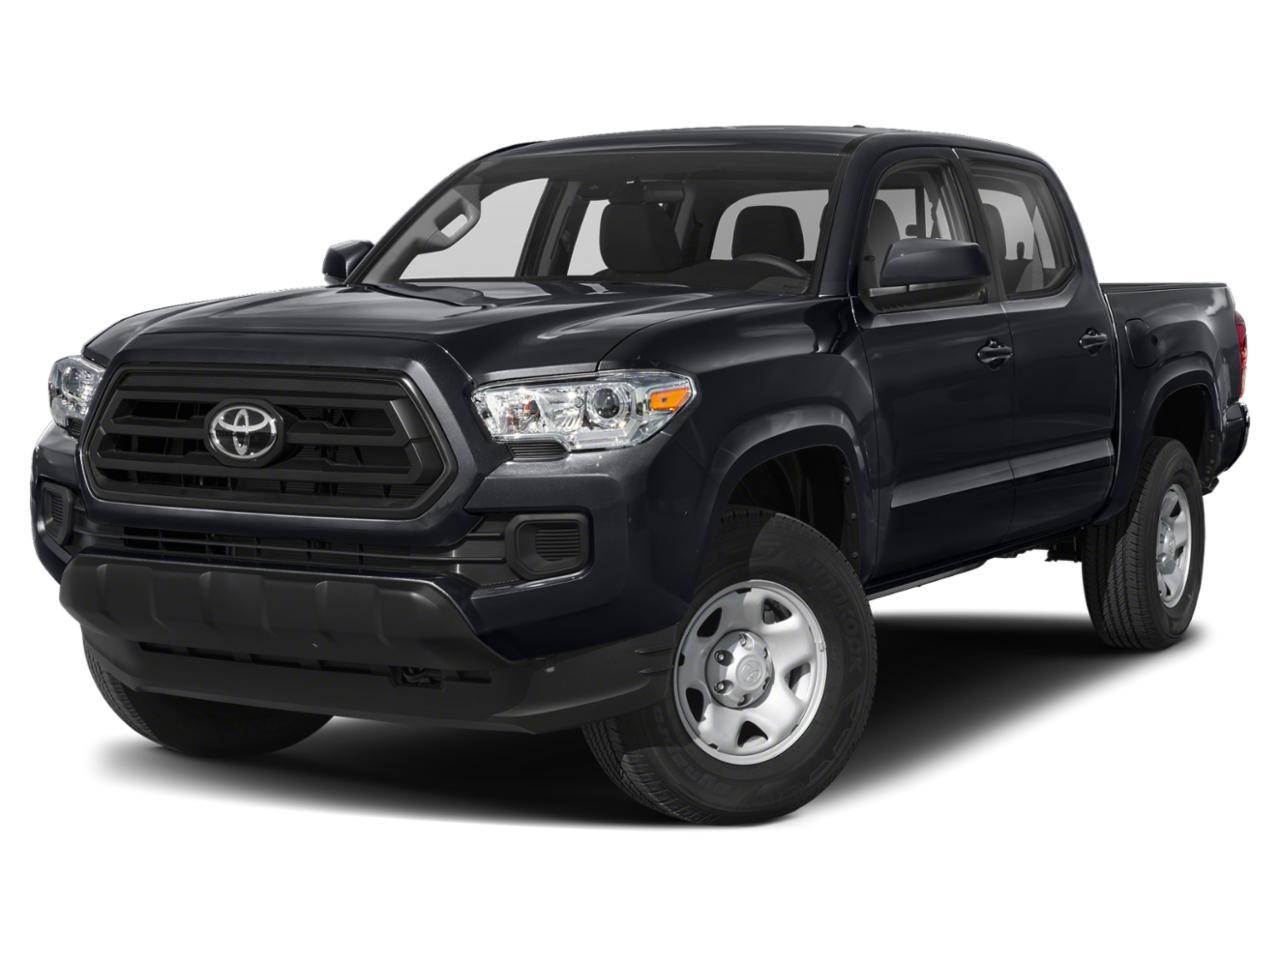 2020 Toyota Tacoma 2WD Vehicle Photo in Richmond, TX 77469